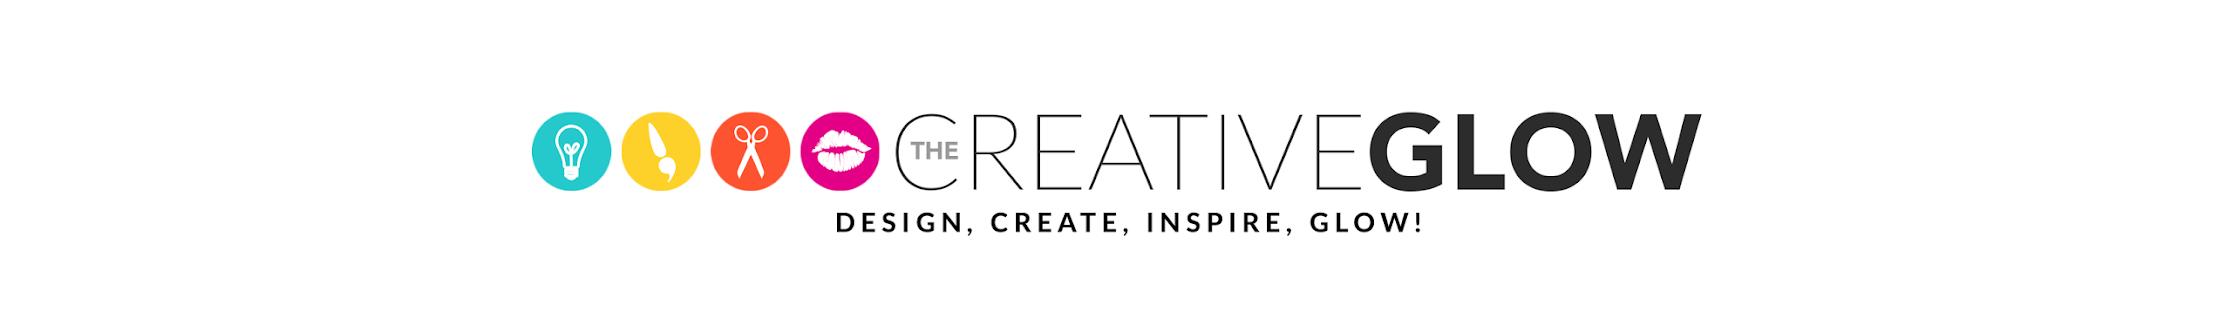 The Creative Glow